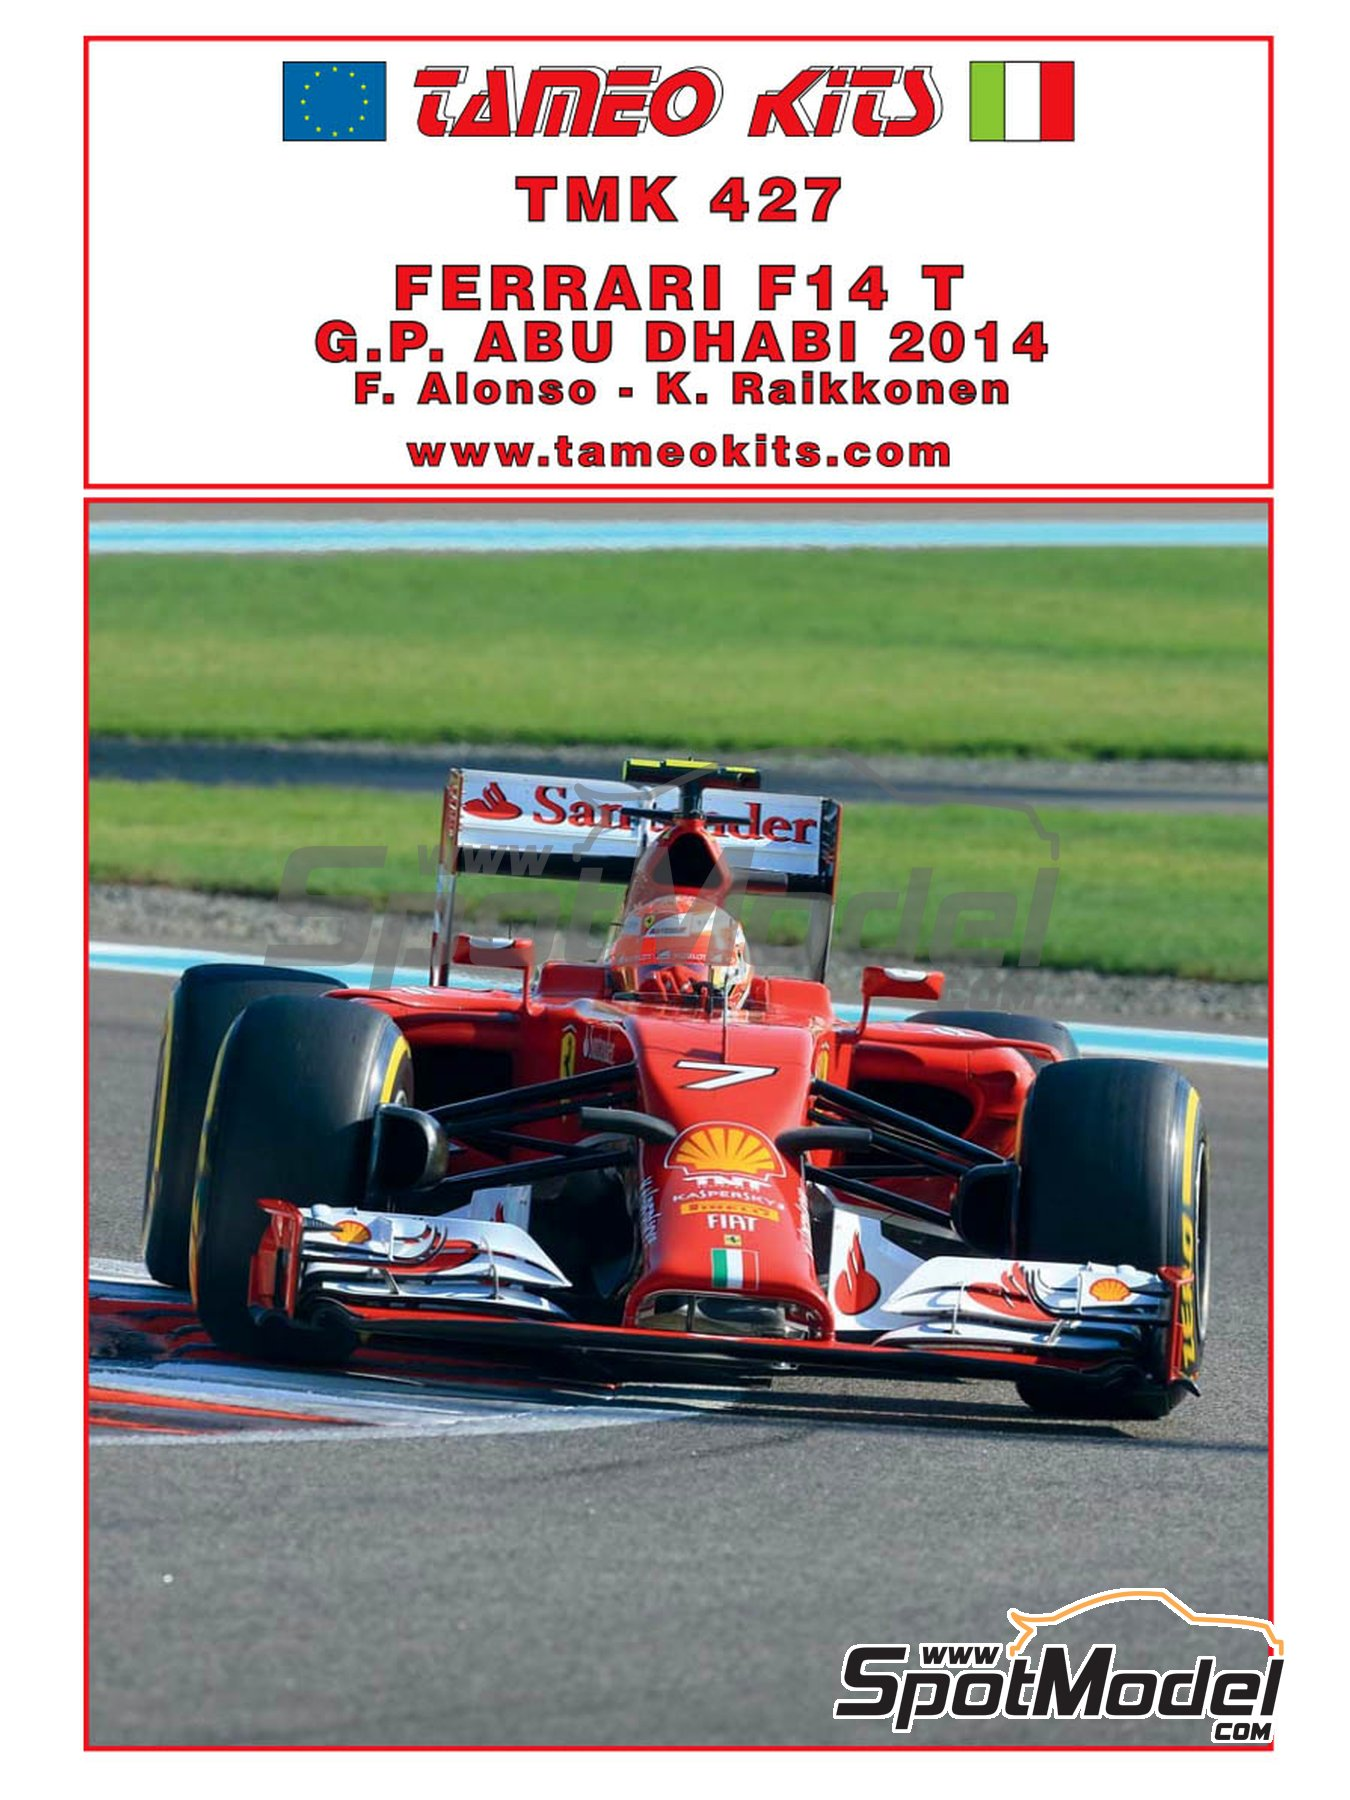 Ferrari F14 - Gran Premio de Abu Dhabi 2014 | Maqueta de coche en escala1/43 fabricado por Tameo Kits (ref.TMK427) image